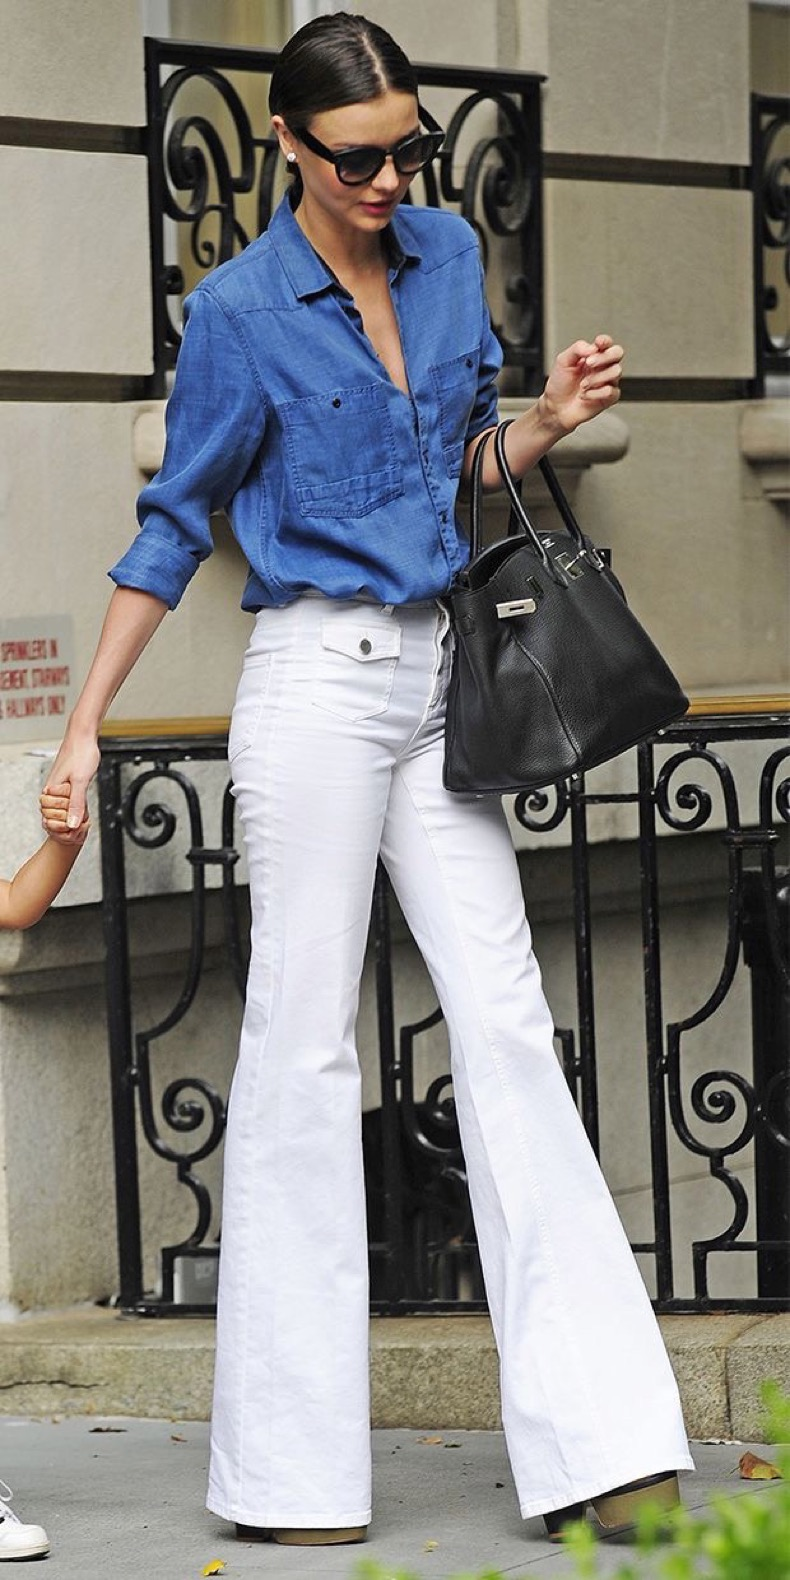 flared-jeans-spring-trend-street-fashion-miranda-kerr